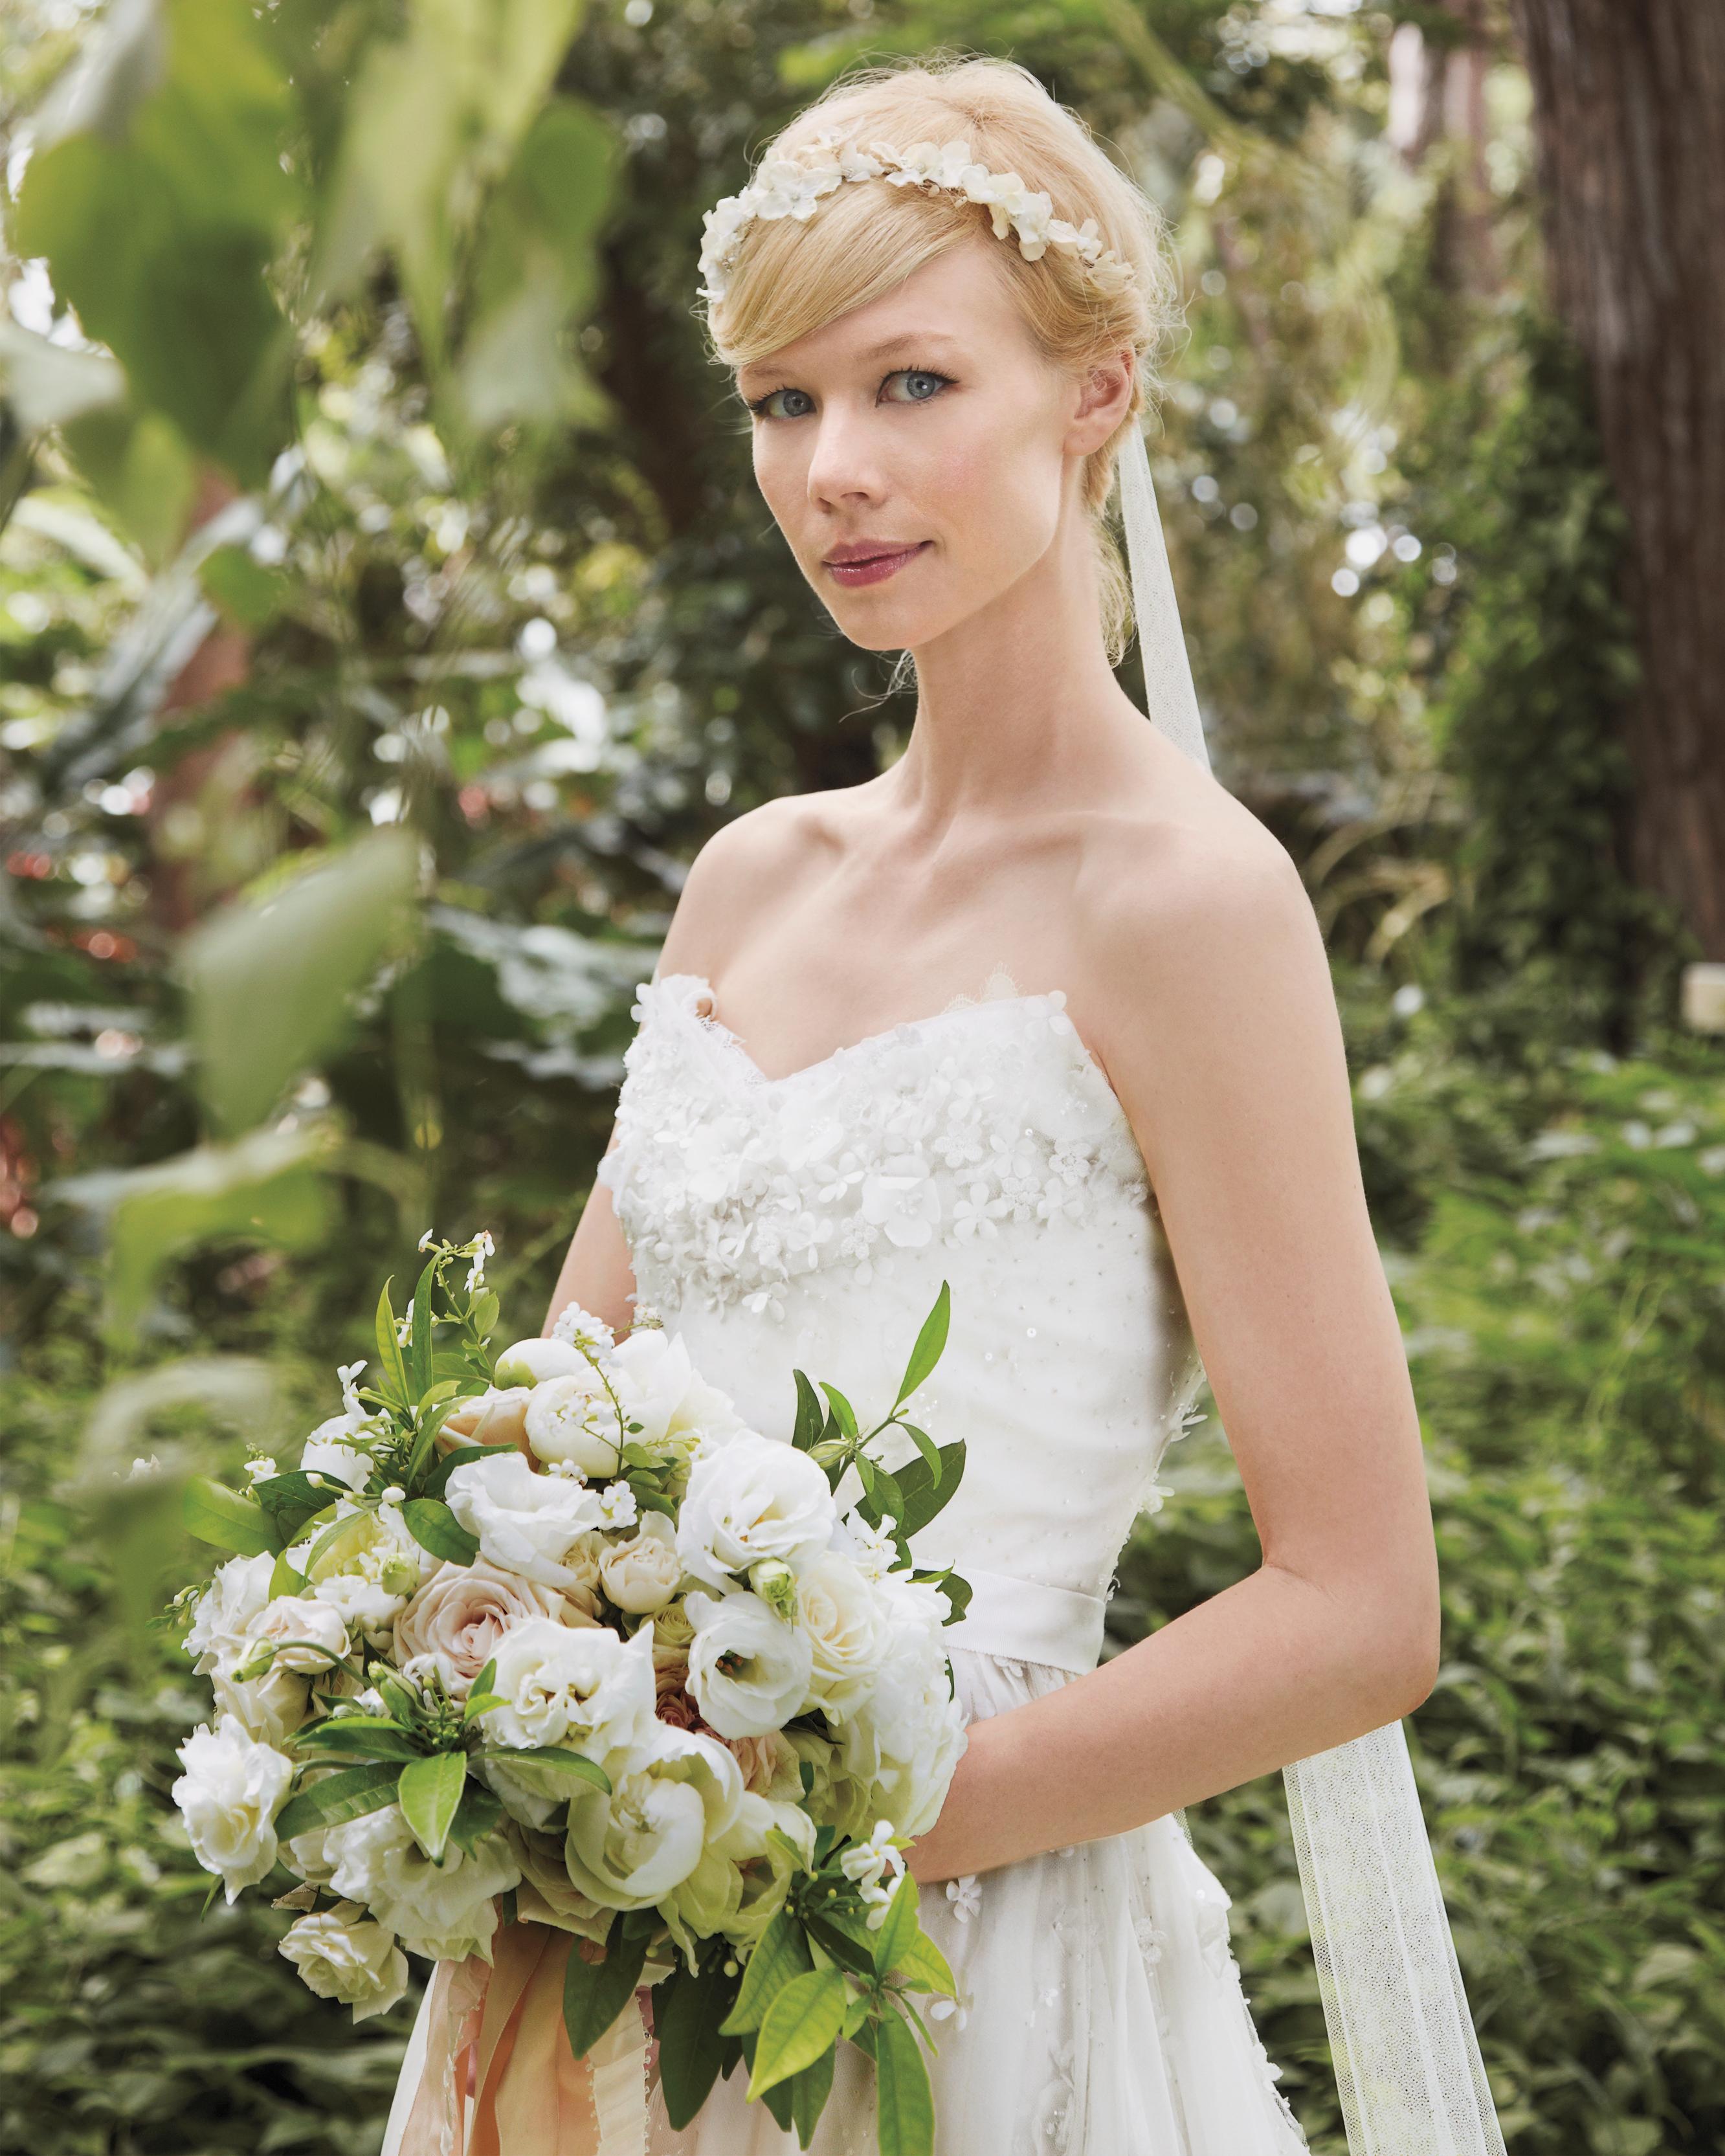 erin-gabe-bride-0156-comp-mwd110114.jpg